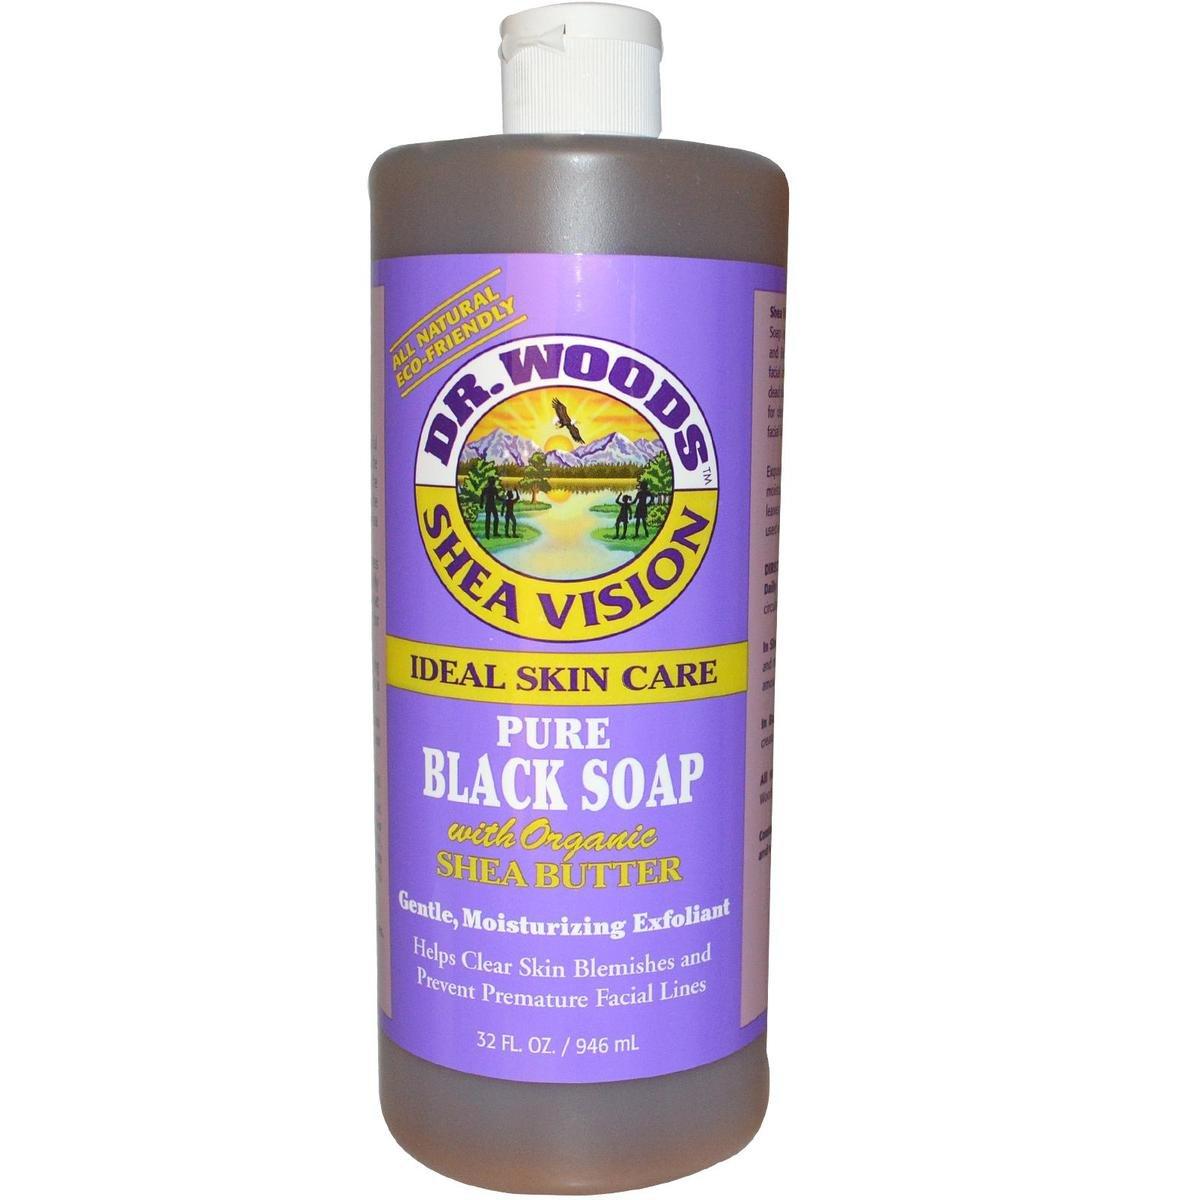 Dr. Woods 全天然純黑皂液(含有機乳木果油) 946毫升